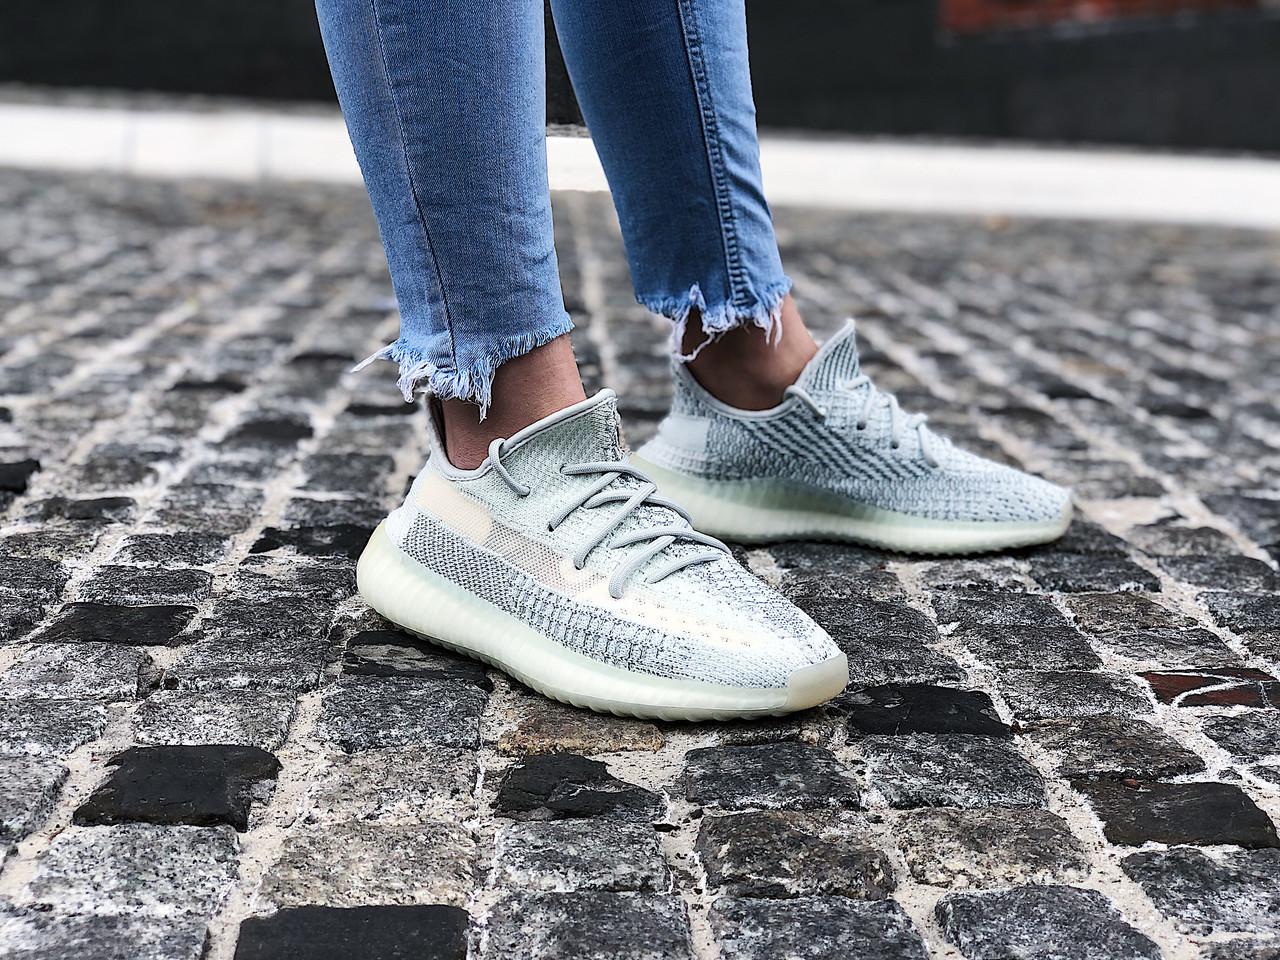 "Кроссовки женские Adidas Yeezy Boost 350 V2 ""Cloud White Reflective"" (Размеры:40,41)"